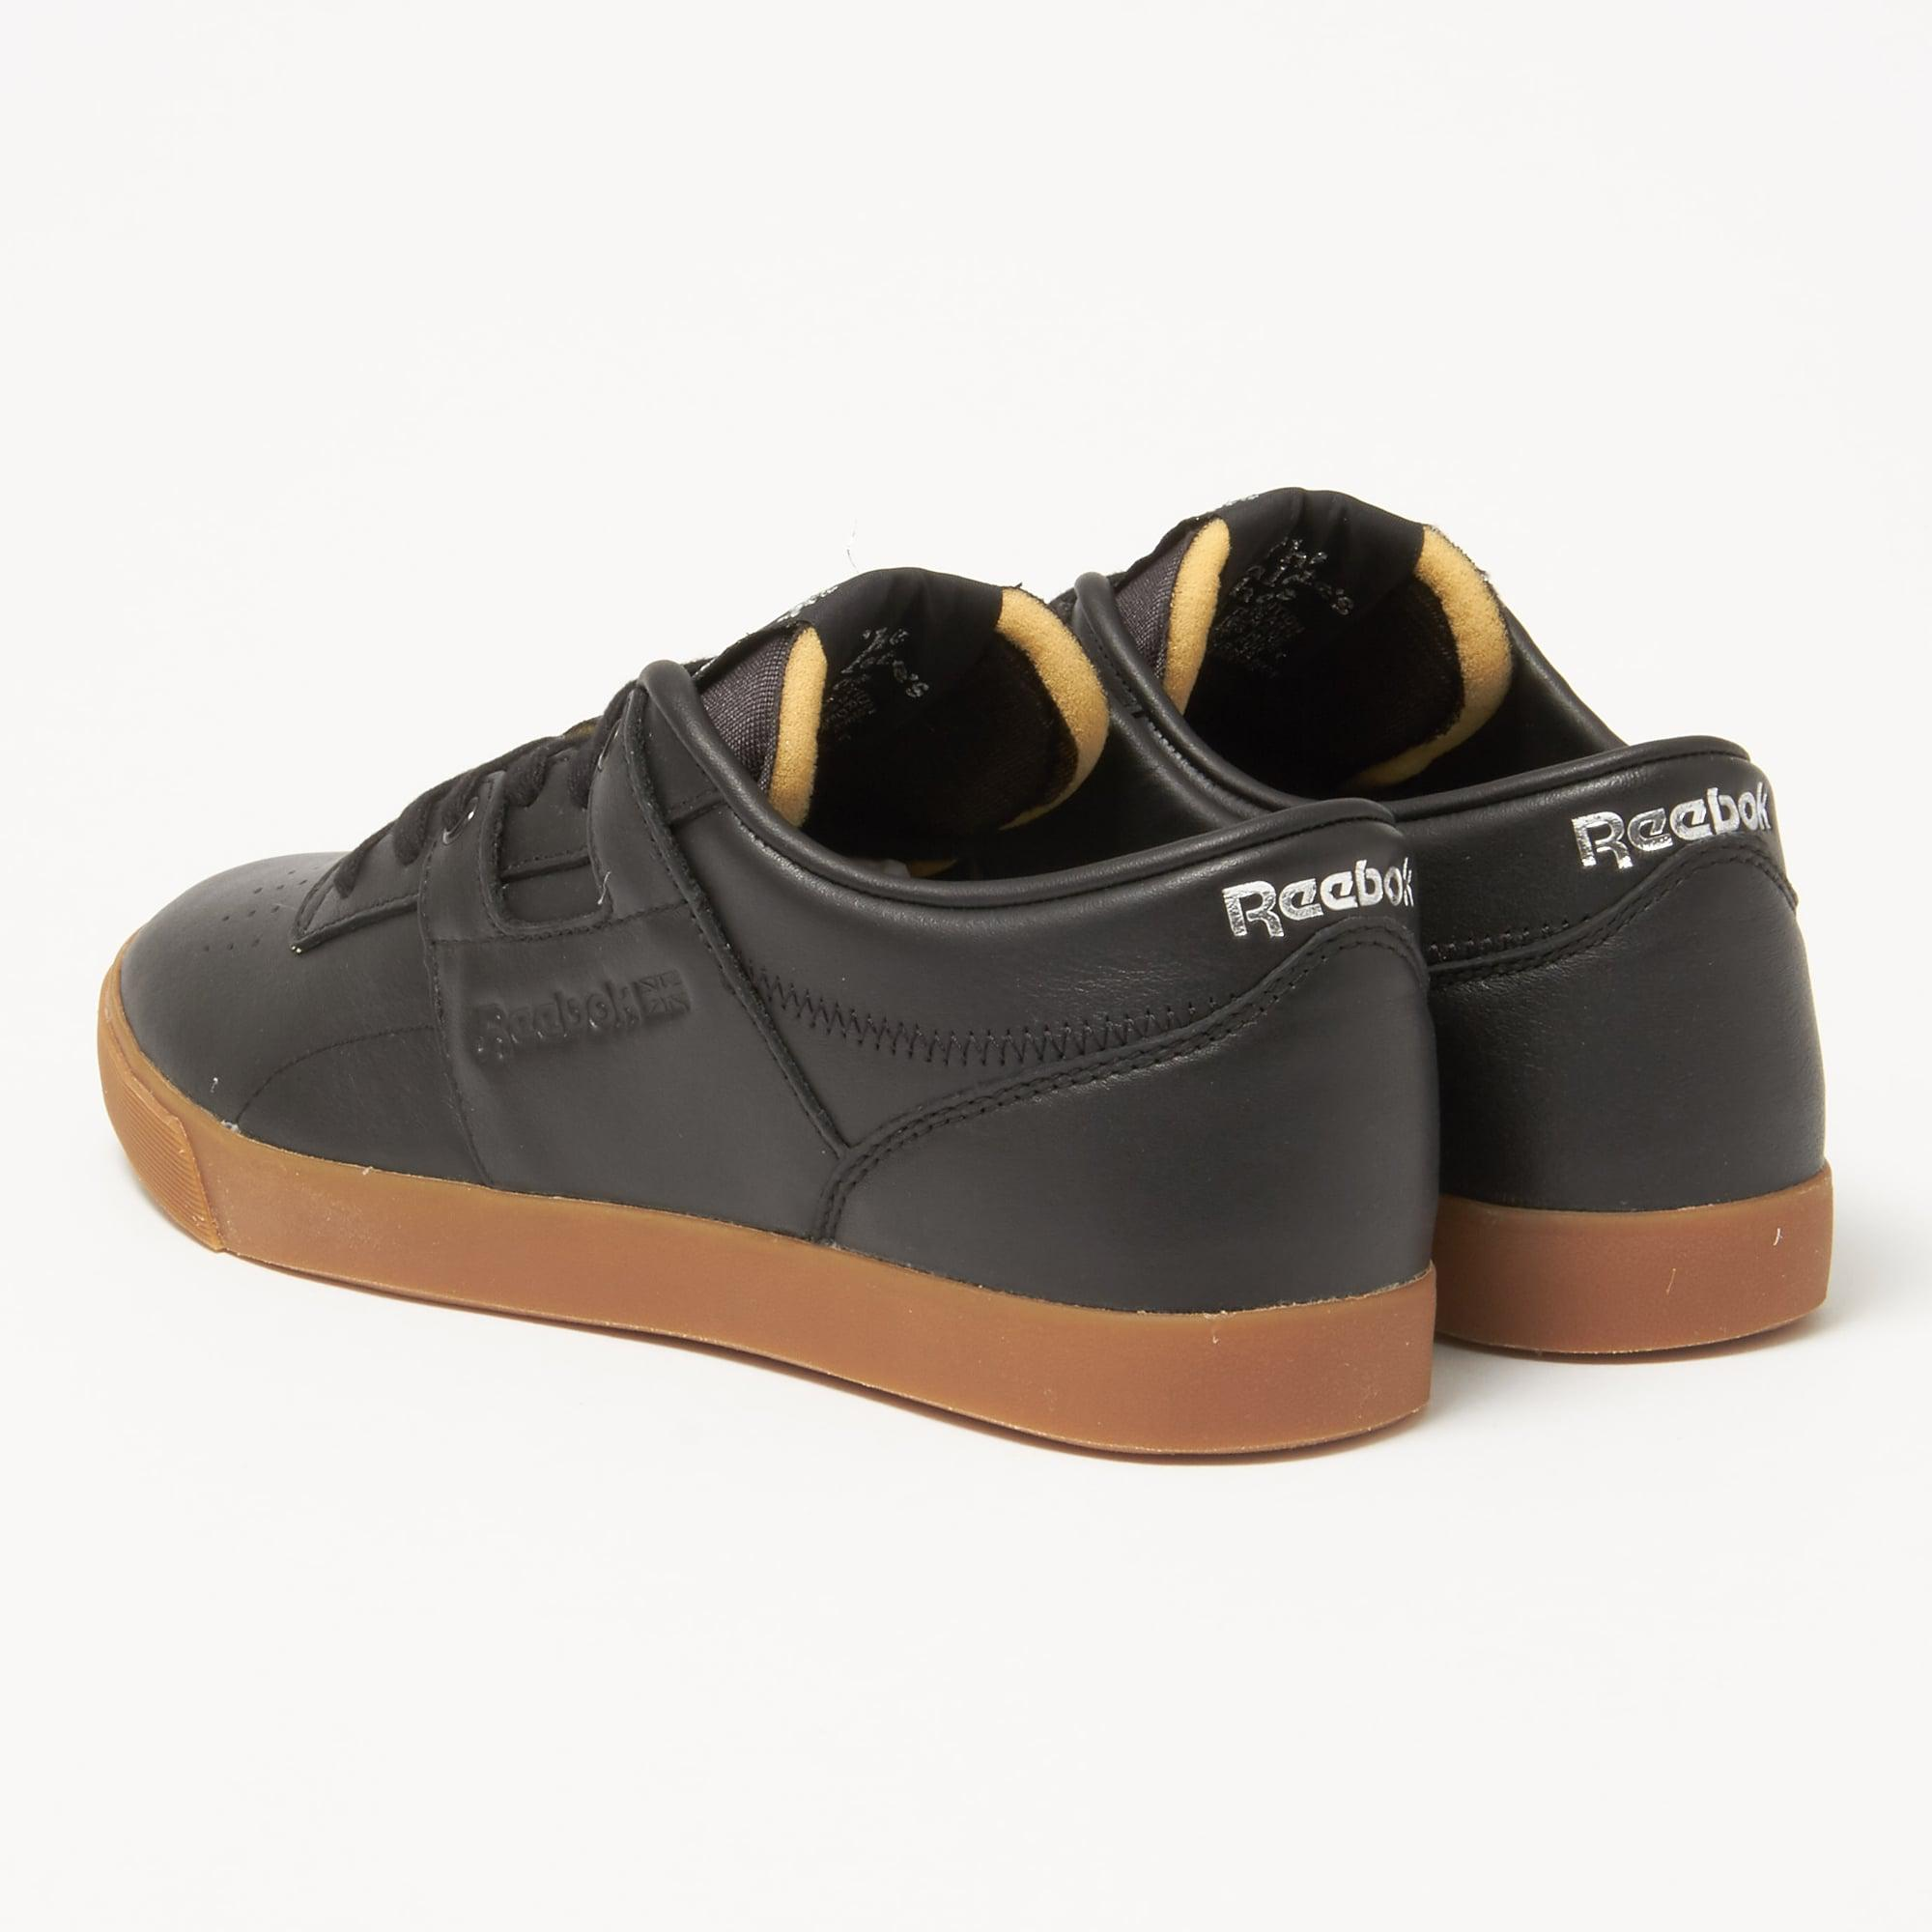 74b64bee4a6 Reebok - Workout Low Clean Fvs Gum Black Sneakers for Men - Lyst. View  fullscreen